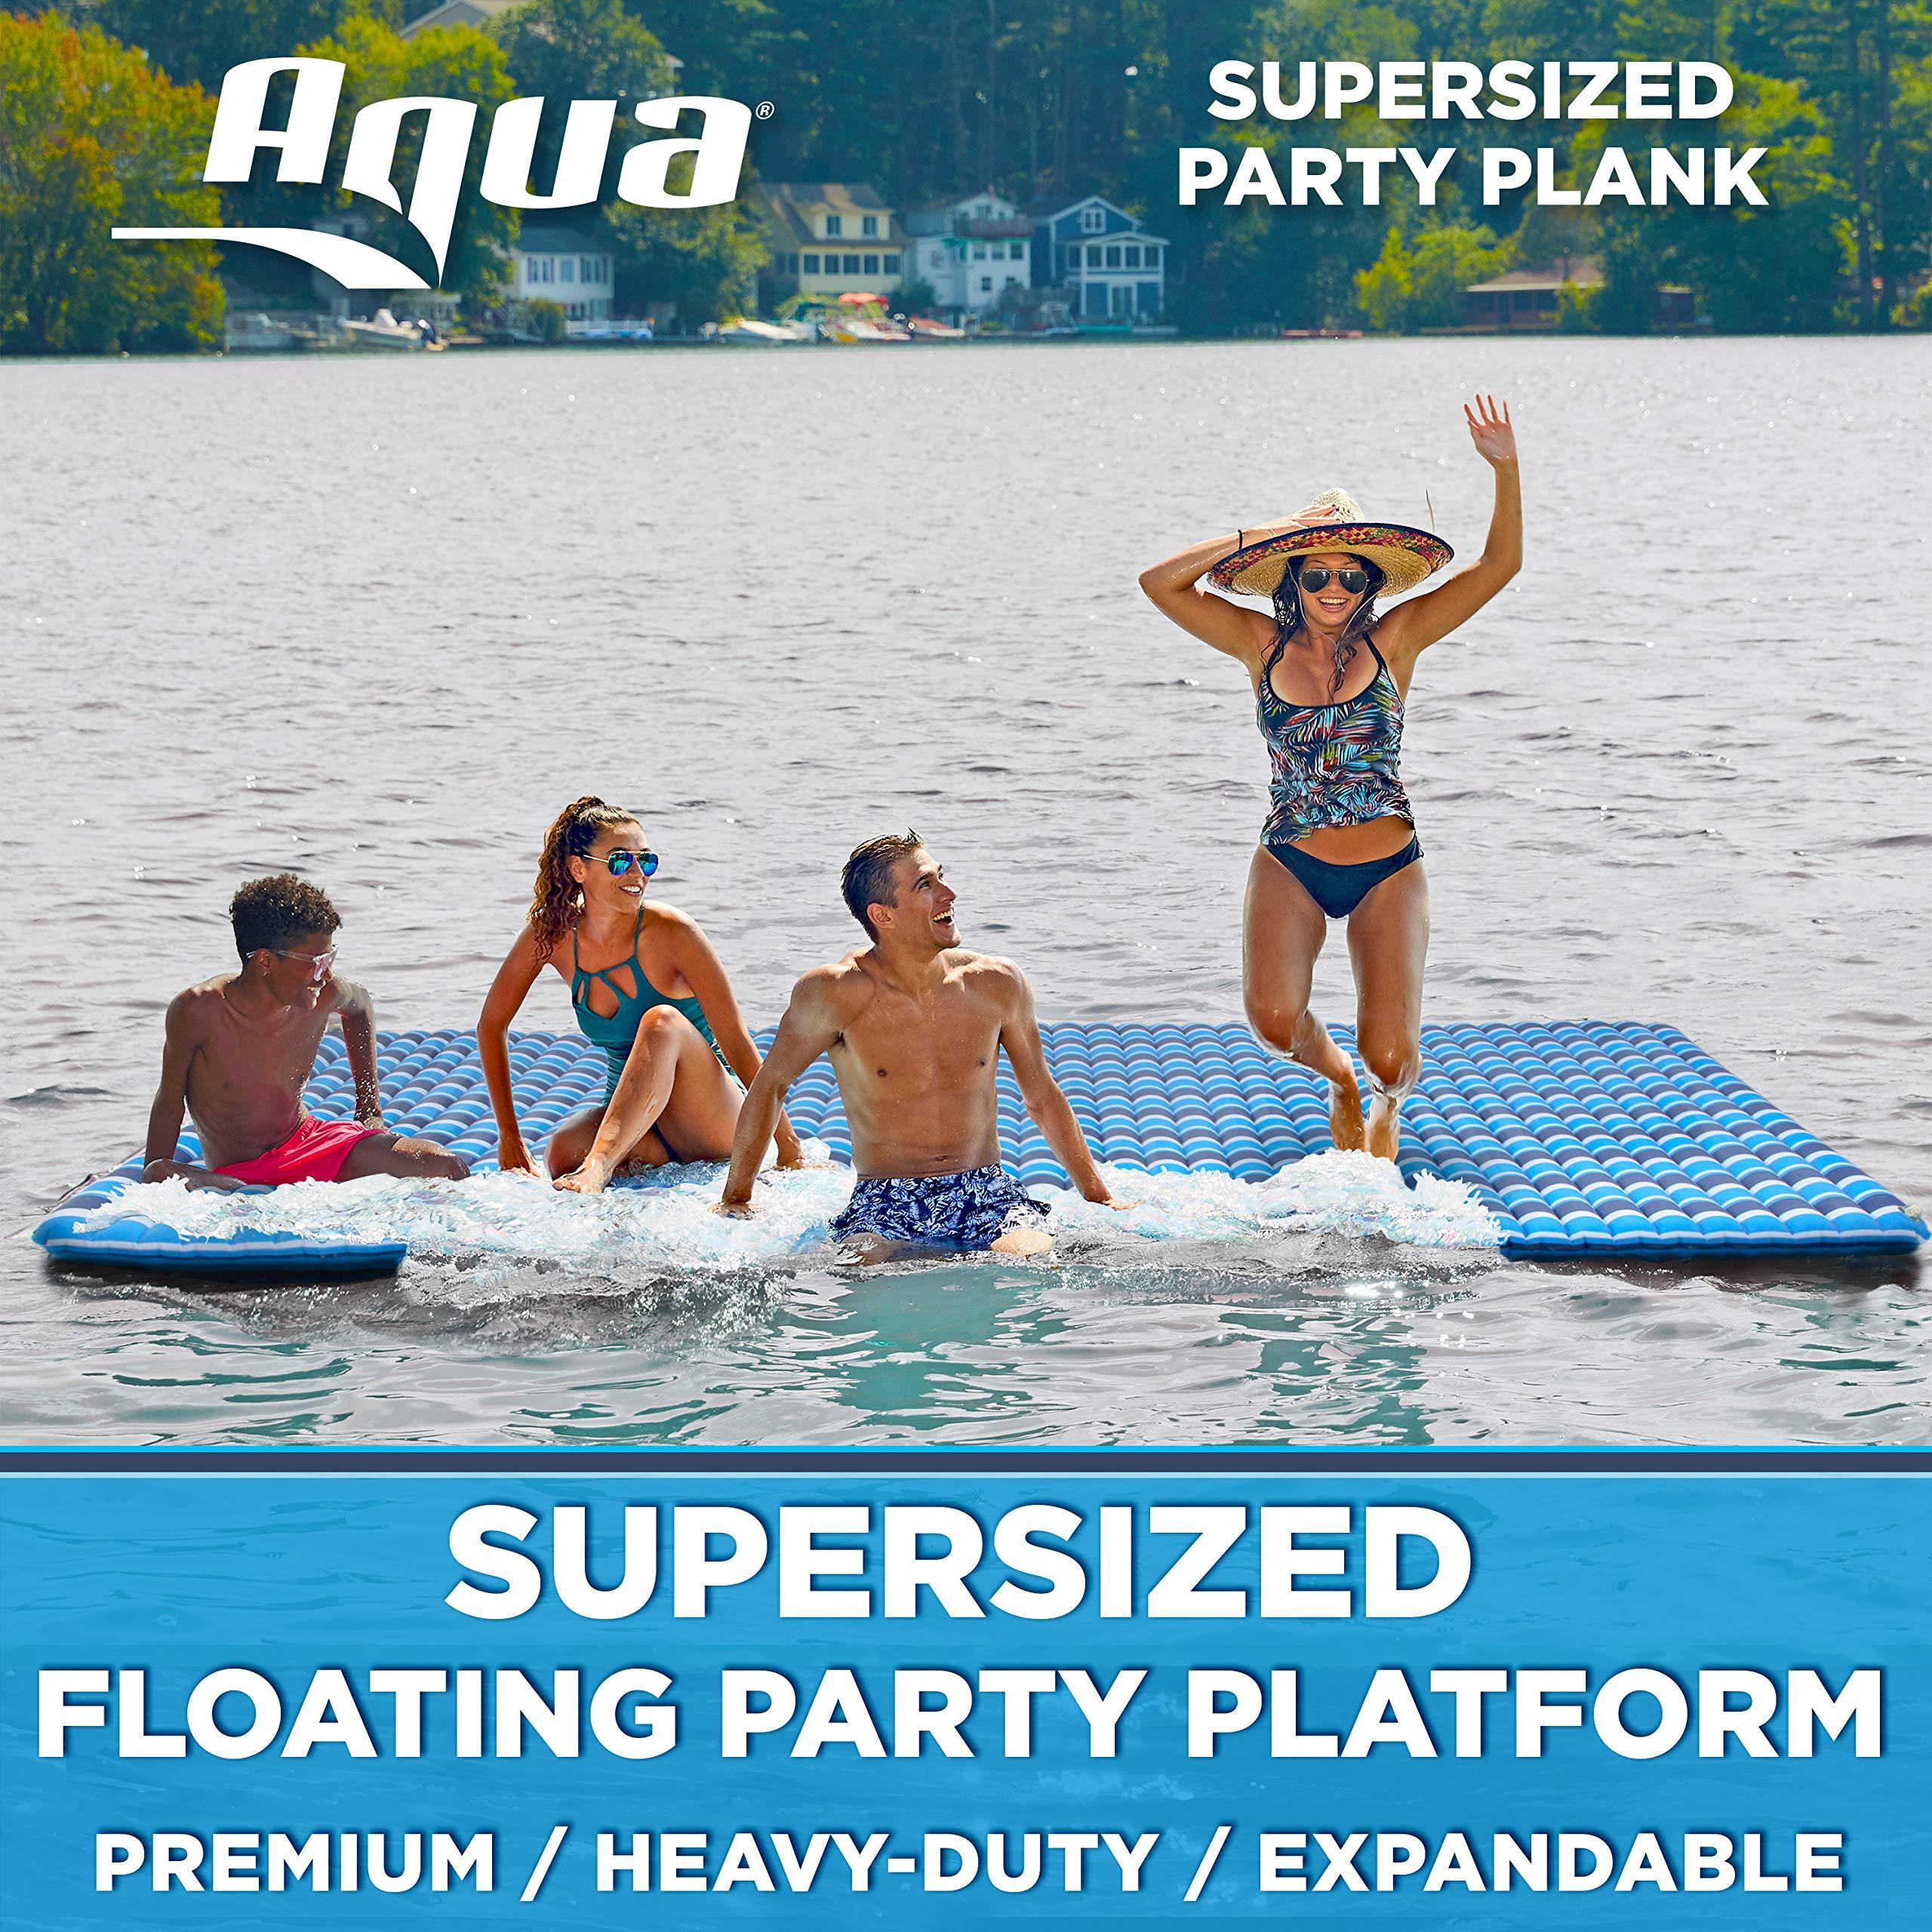 Aqua Expandable Floating Island, Lake Raft, Water Mat, Inflatable Lake-Ocean-Pool Float, 1, 000 Lbs. Capacity, Heavy Duty, X-Large, Navy/White Stripe by Aqua